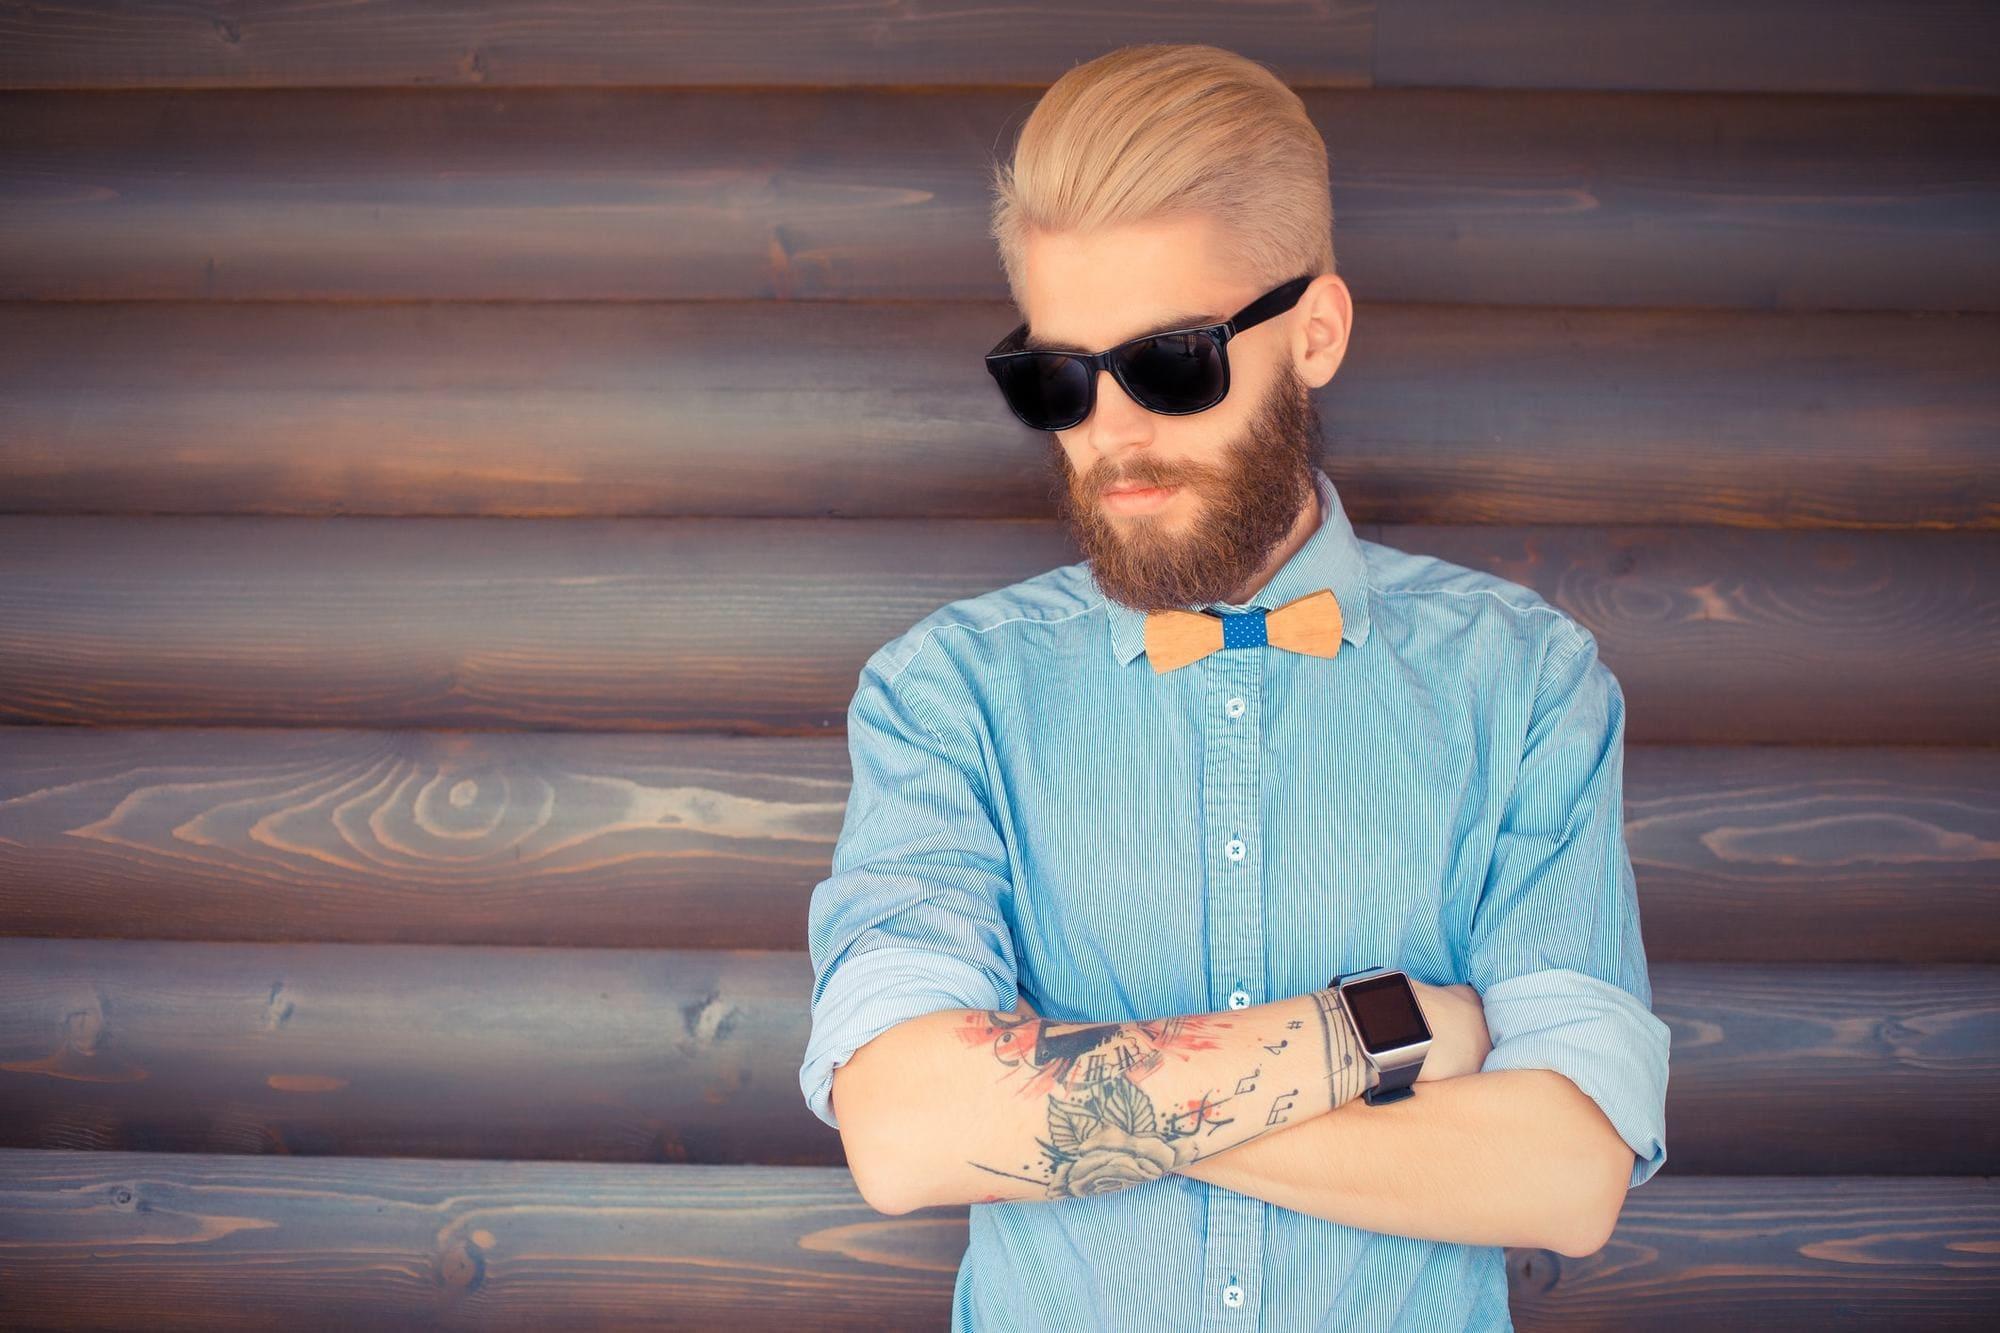 Trendy Men's Popular Haircuts -Short on Sides Long 3